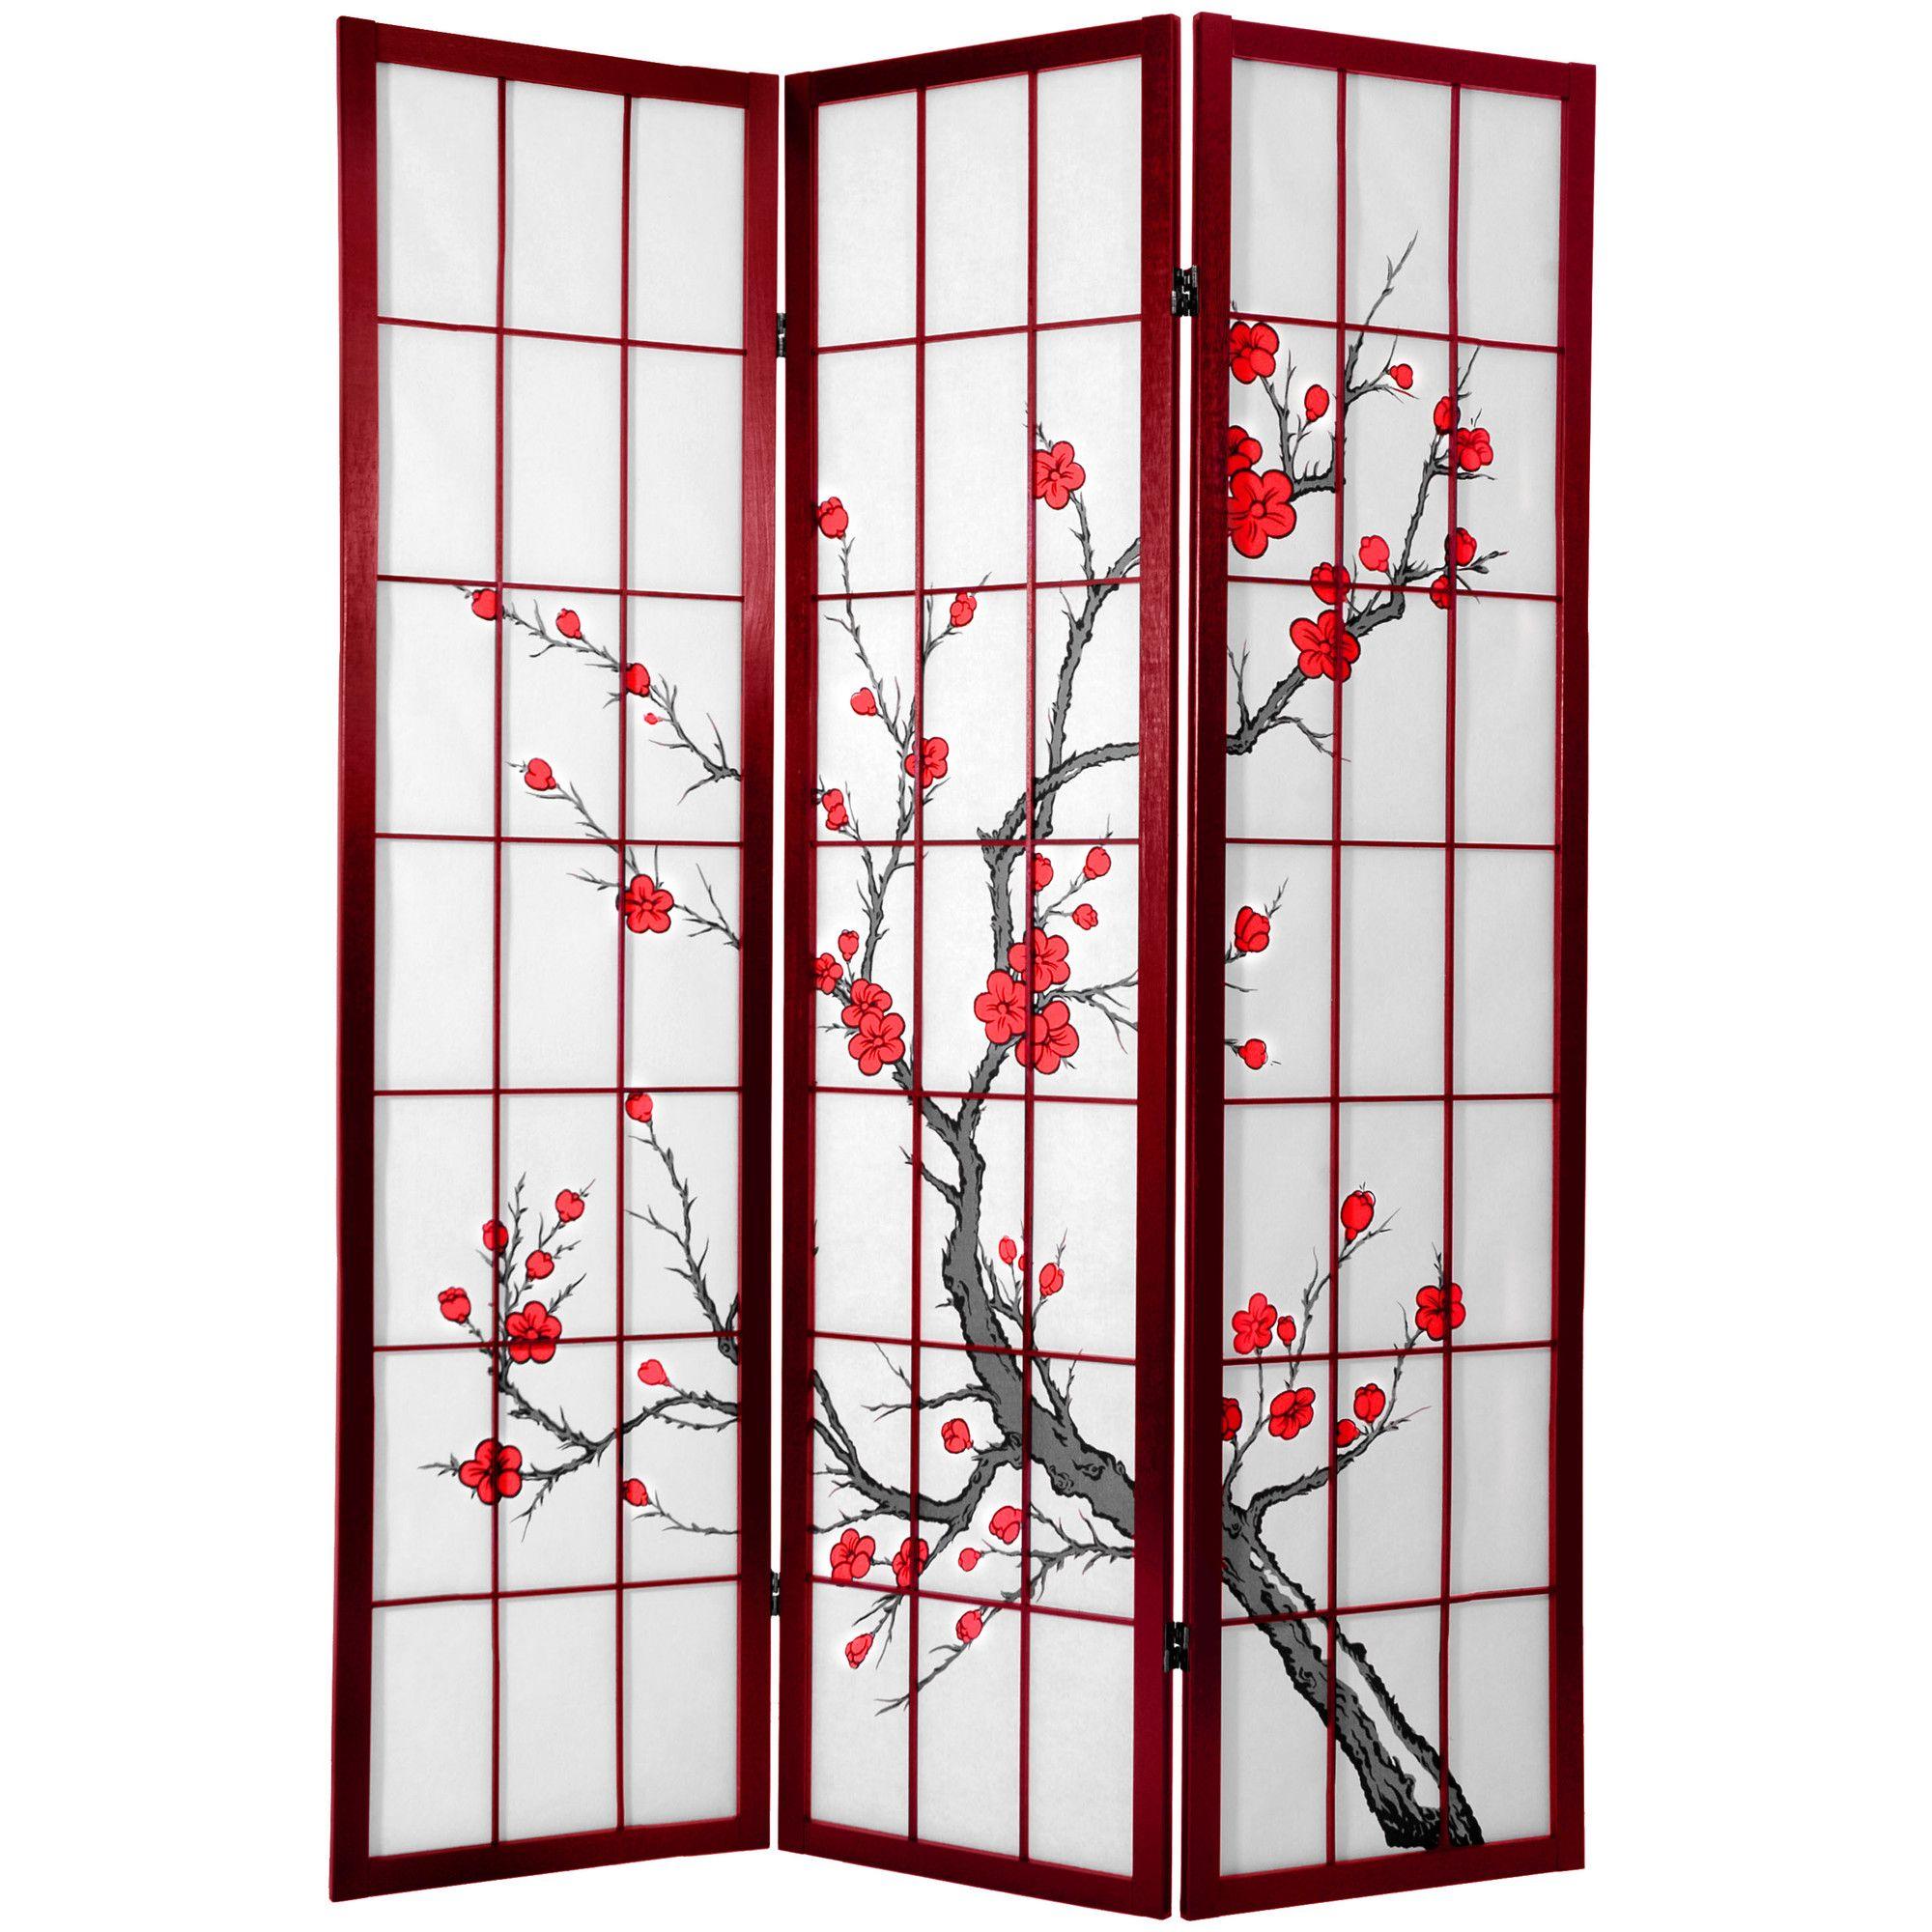 71 X 51 Tall Cherry Blossom Shoji Screen Room Divider